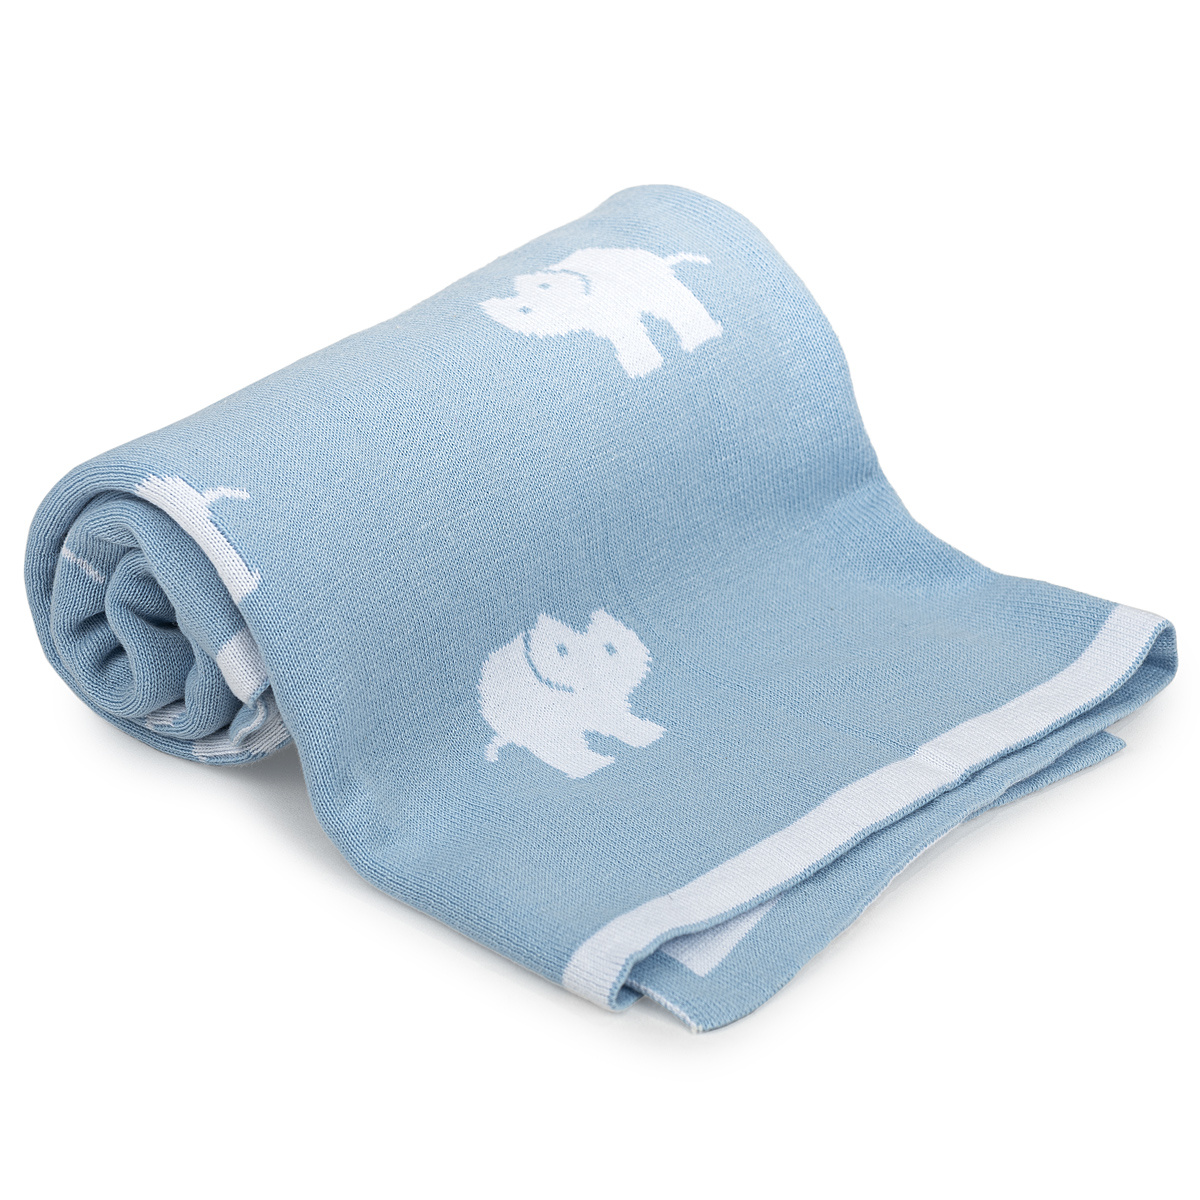 4home Detská bavlnená deka Slony, 70 x 90 cm